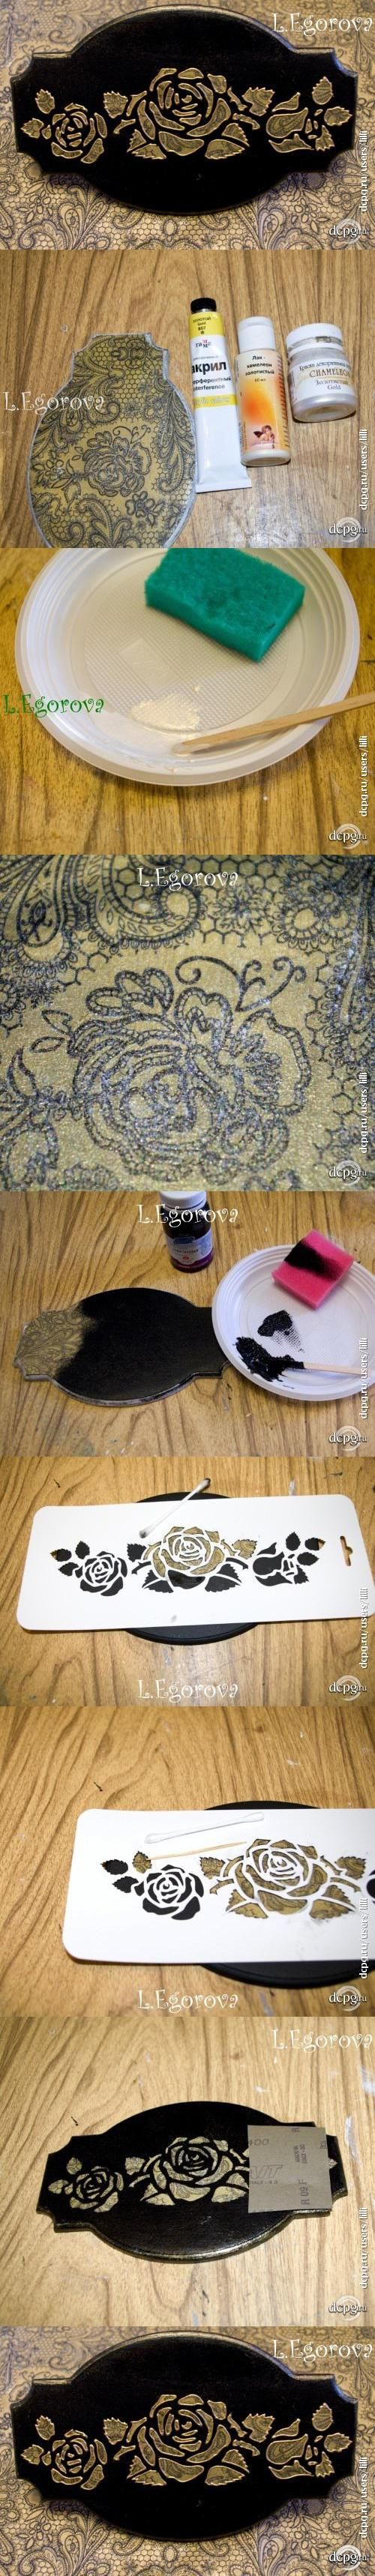 "Декупаж - Сайт любителей декупажа - DCPG.RU | Мини-МК ""Декупажный перевёртыш"" Click on photo to see more! Нажмите на фото чтобы увидеть больше! decoupage art craft handmade home decor DIY do it yourself tutorial Materials and techniques: napkin varnish acrylic paint etc."